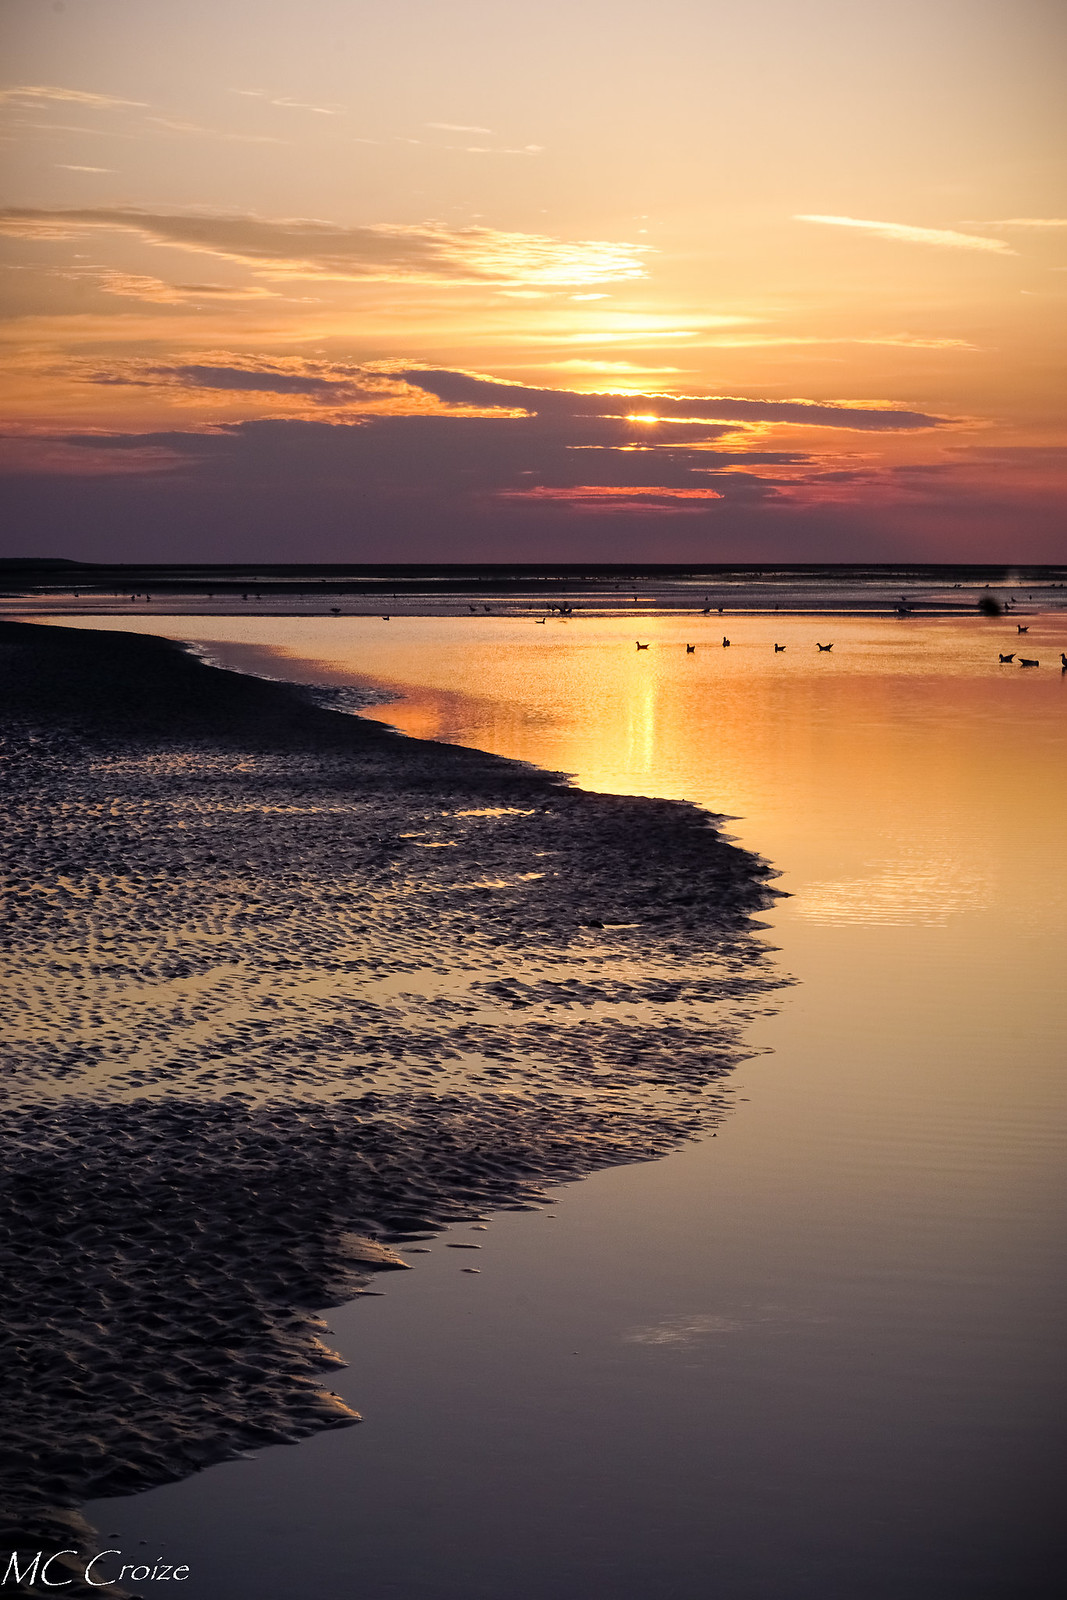 Sunset en baie de somme 30700792138_b5f5a67287_h